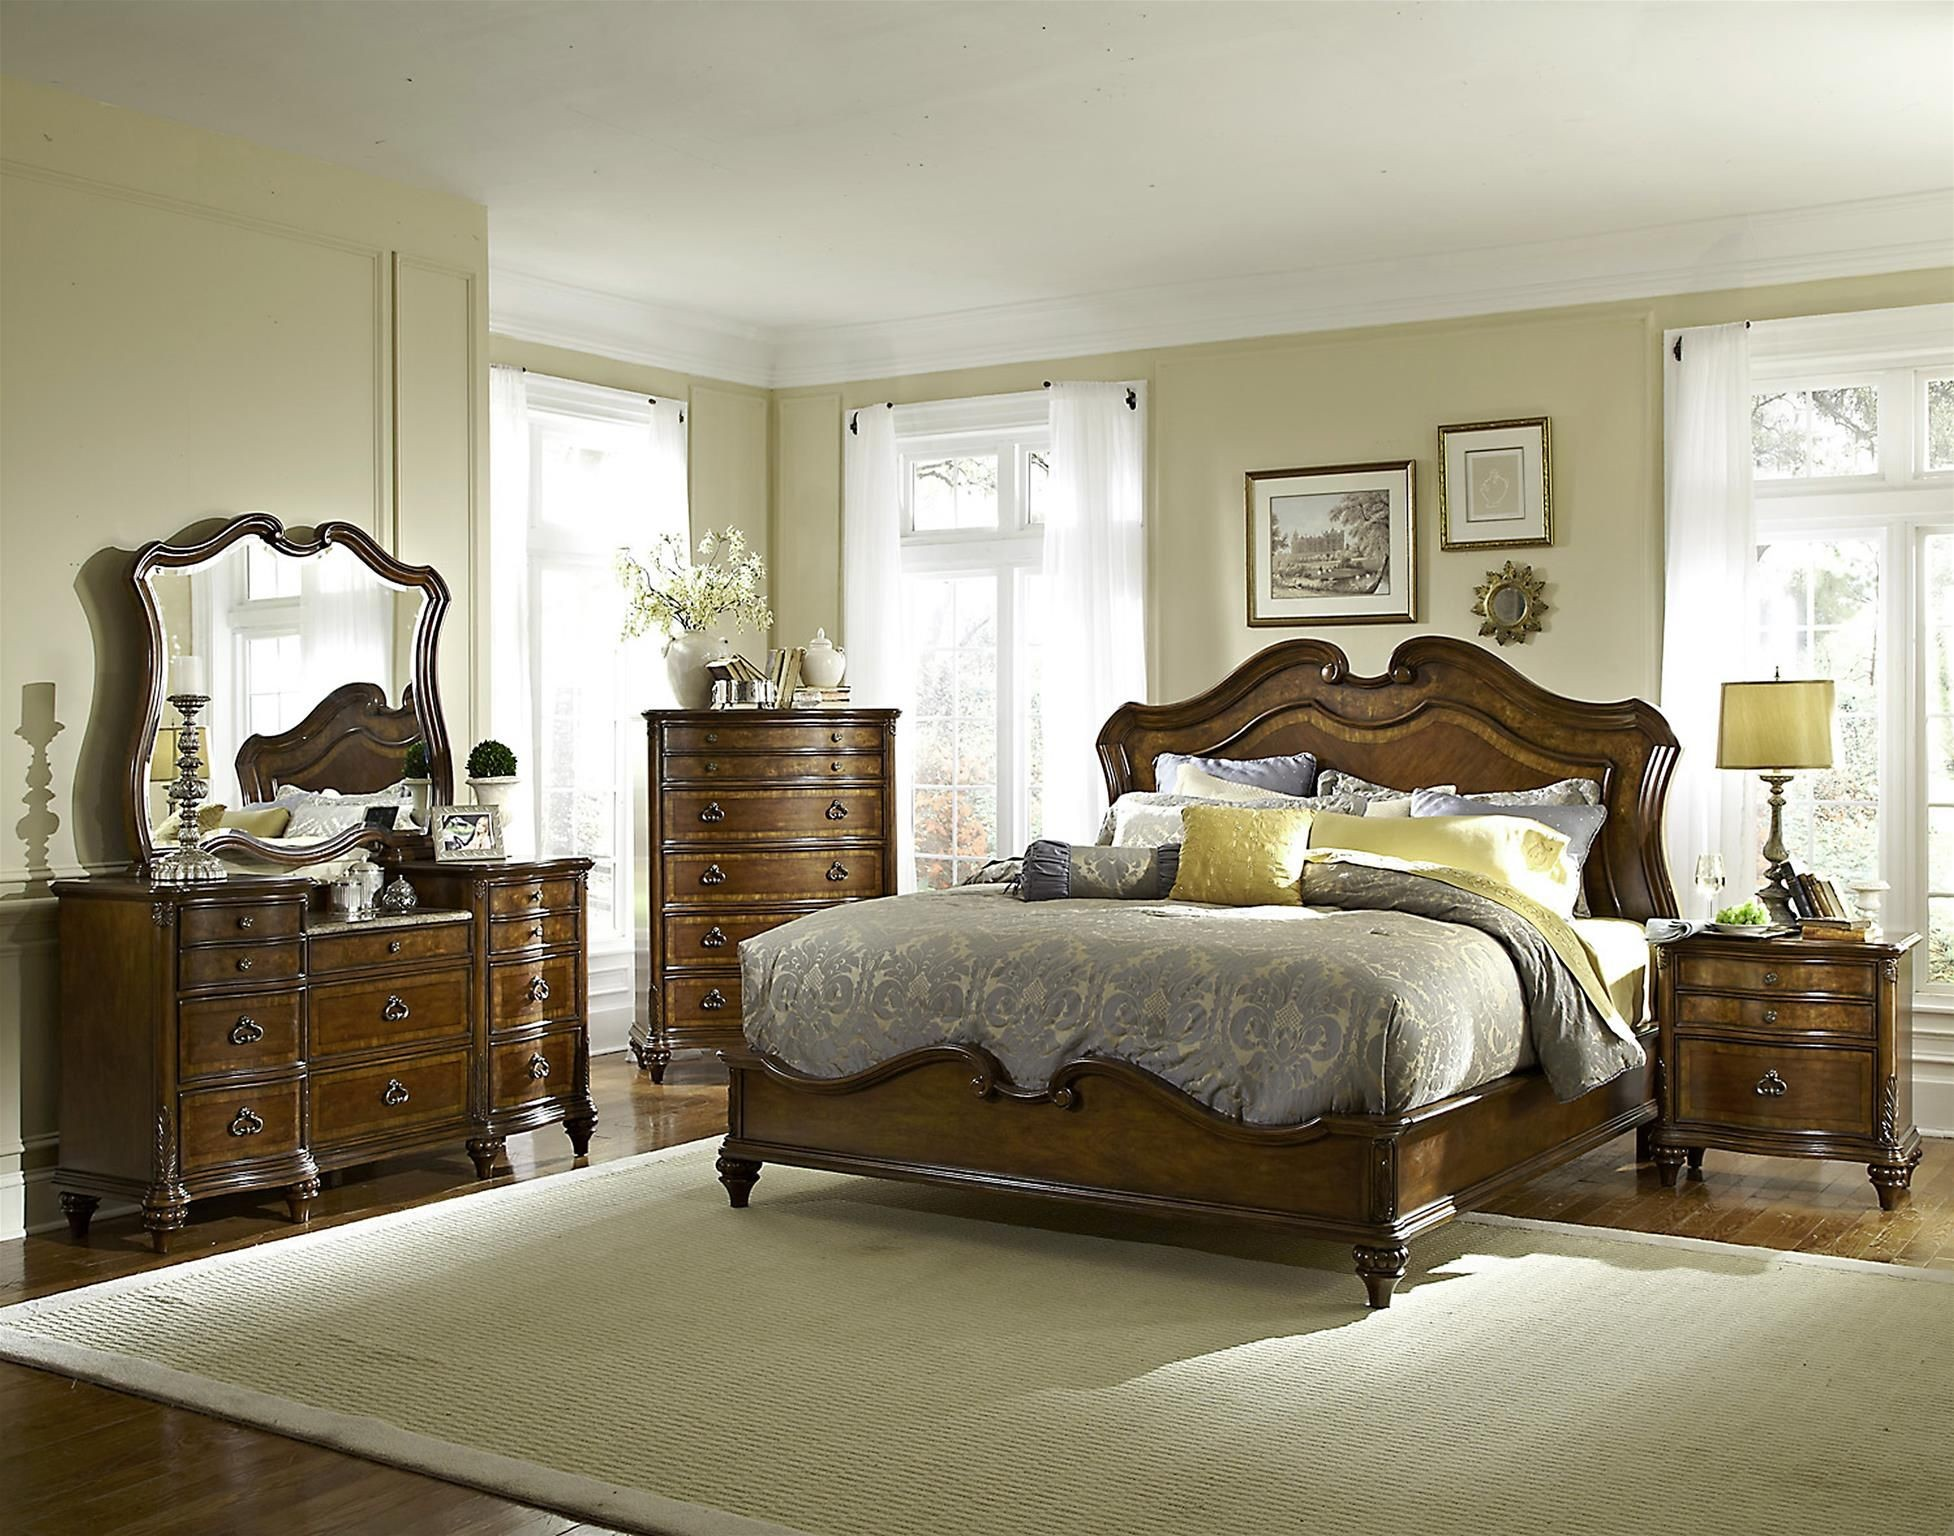 Marisol brighton cherry panel bedroom set from fairmont for Q furniture brighton co